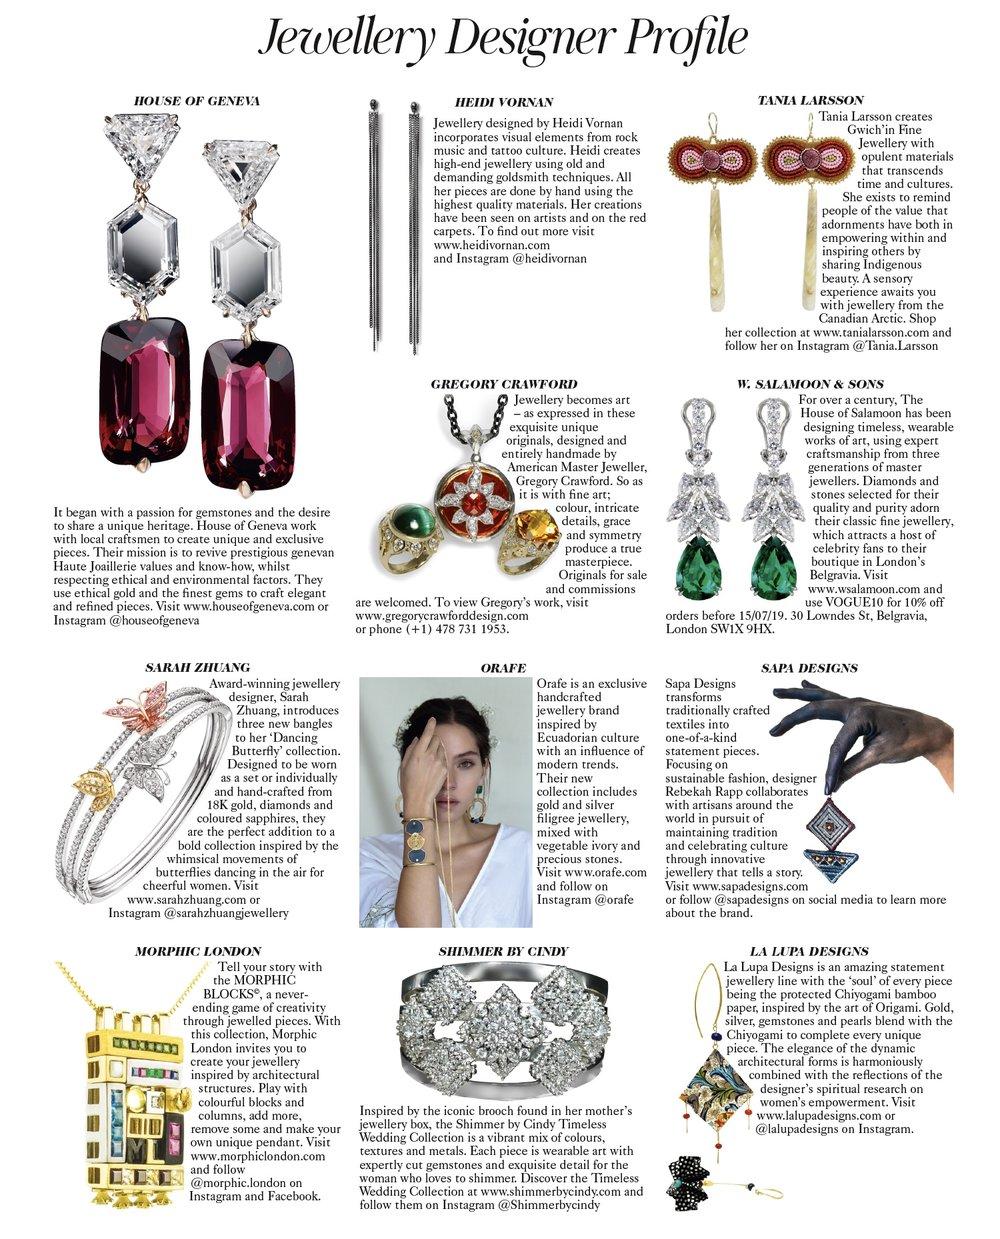 https://www.vogue.co.uk/gallery/vogue-retail-jewellery